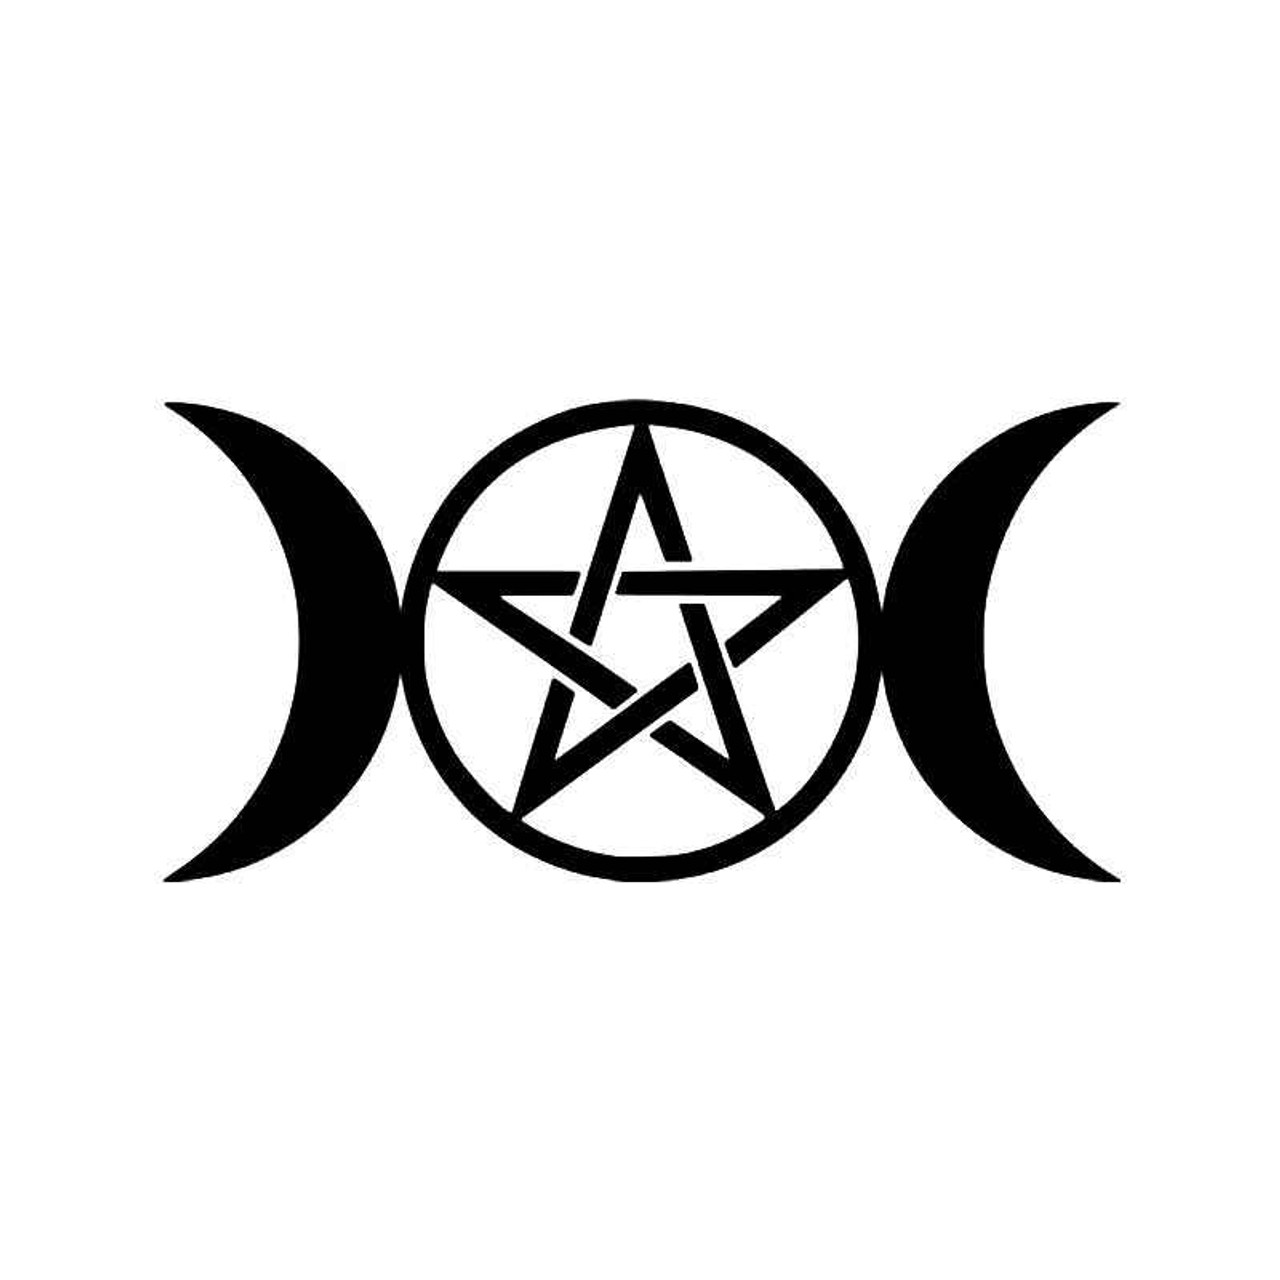 Triple Moon Goddess Wicca Pentacle Pagan Symbol Vinyl Sticker